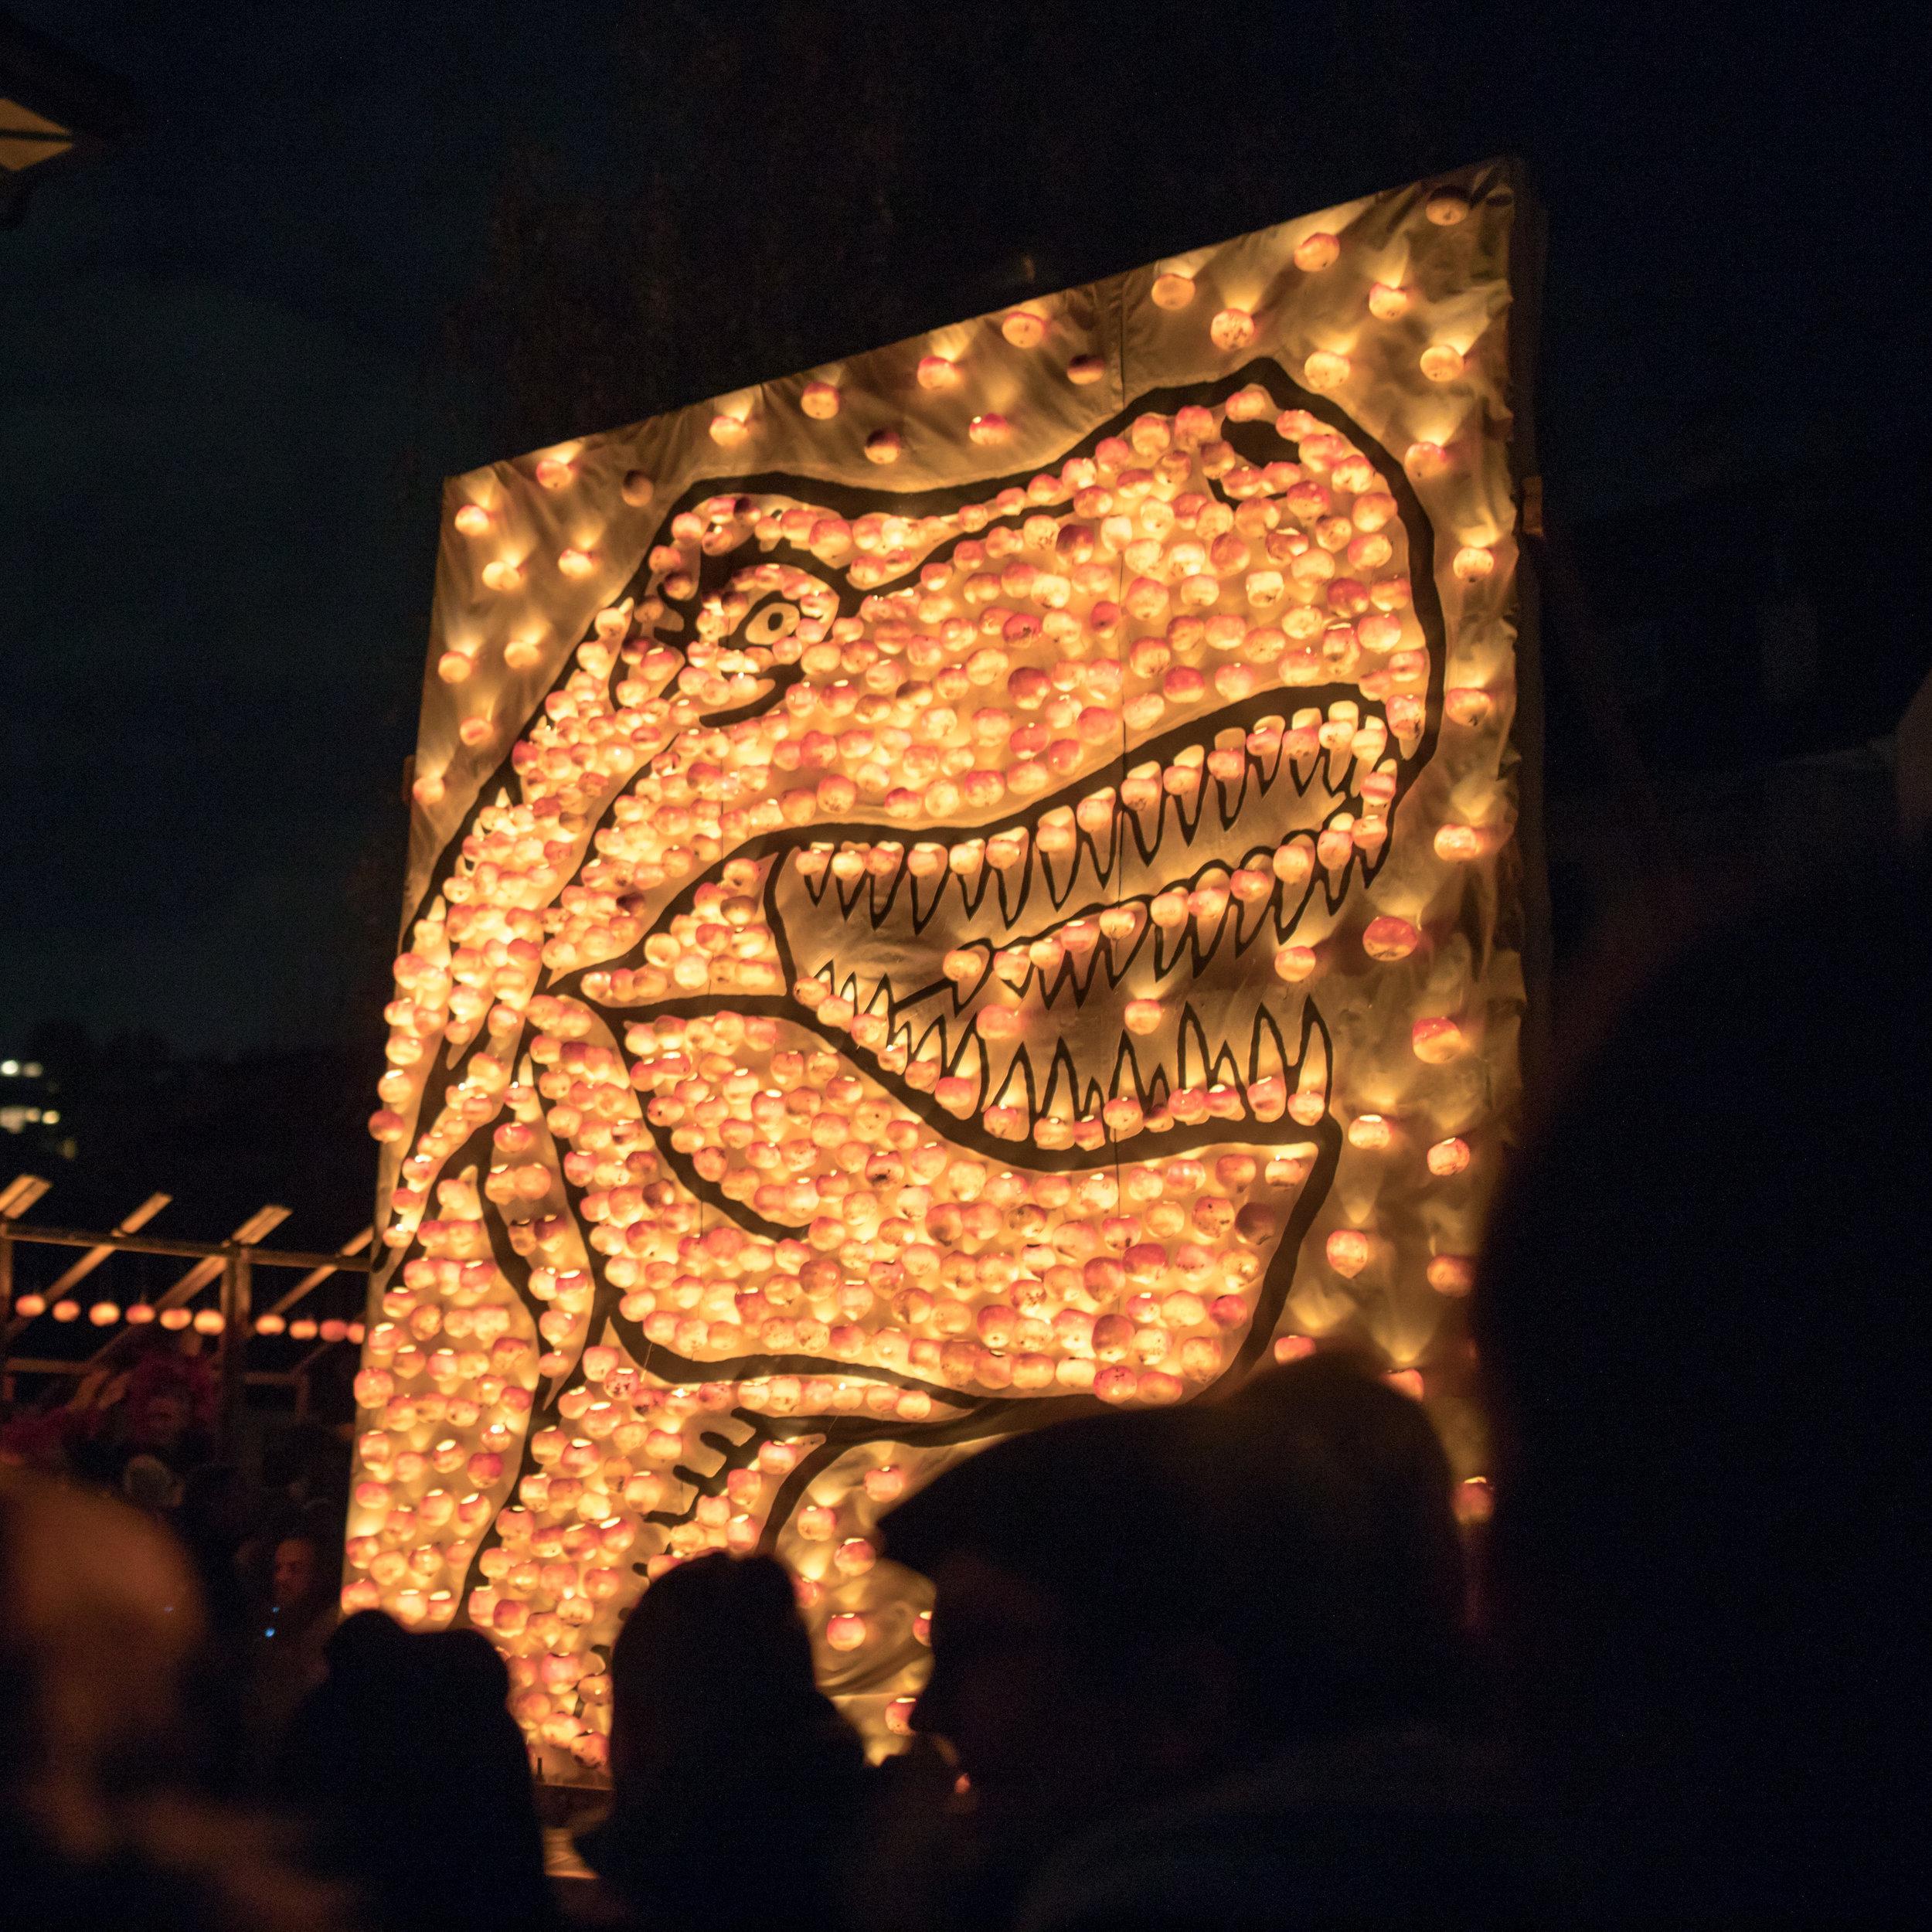 turnip-festival-parade-dinosaur-richterswil-switzerland.jpg